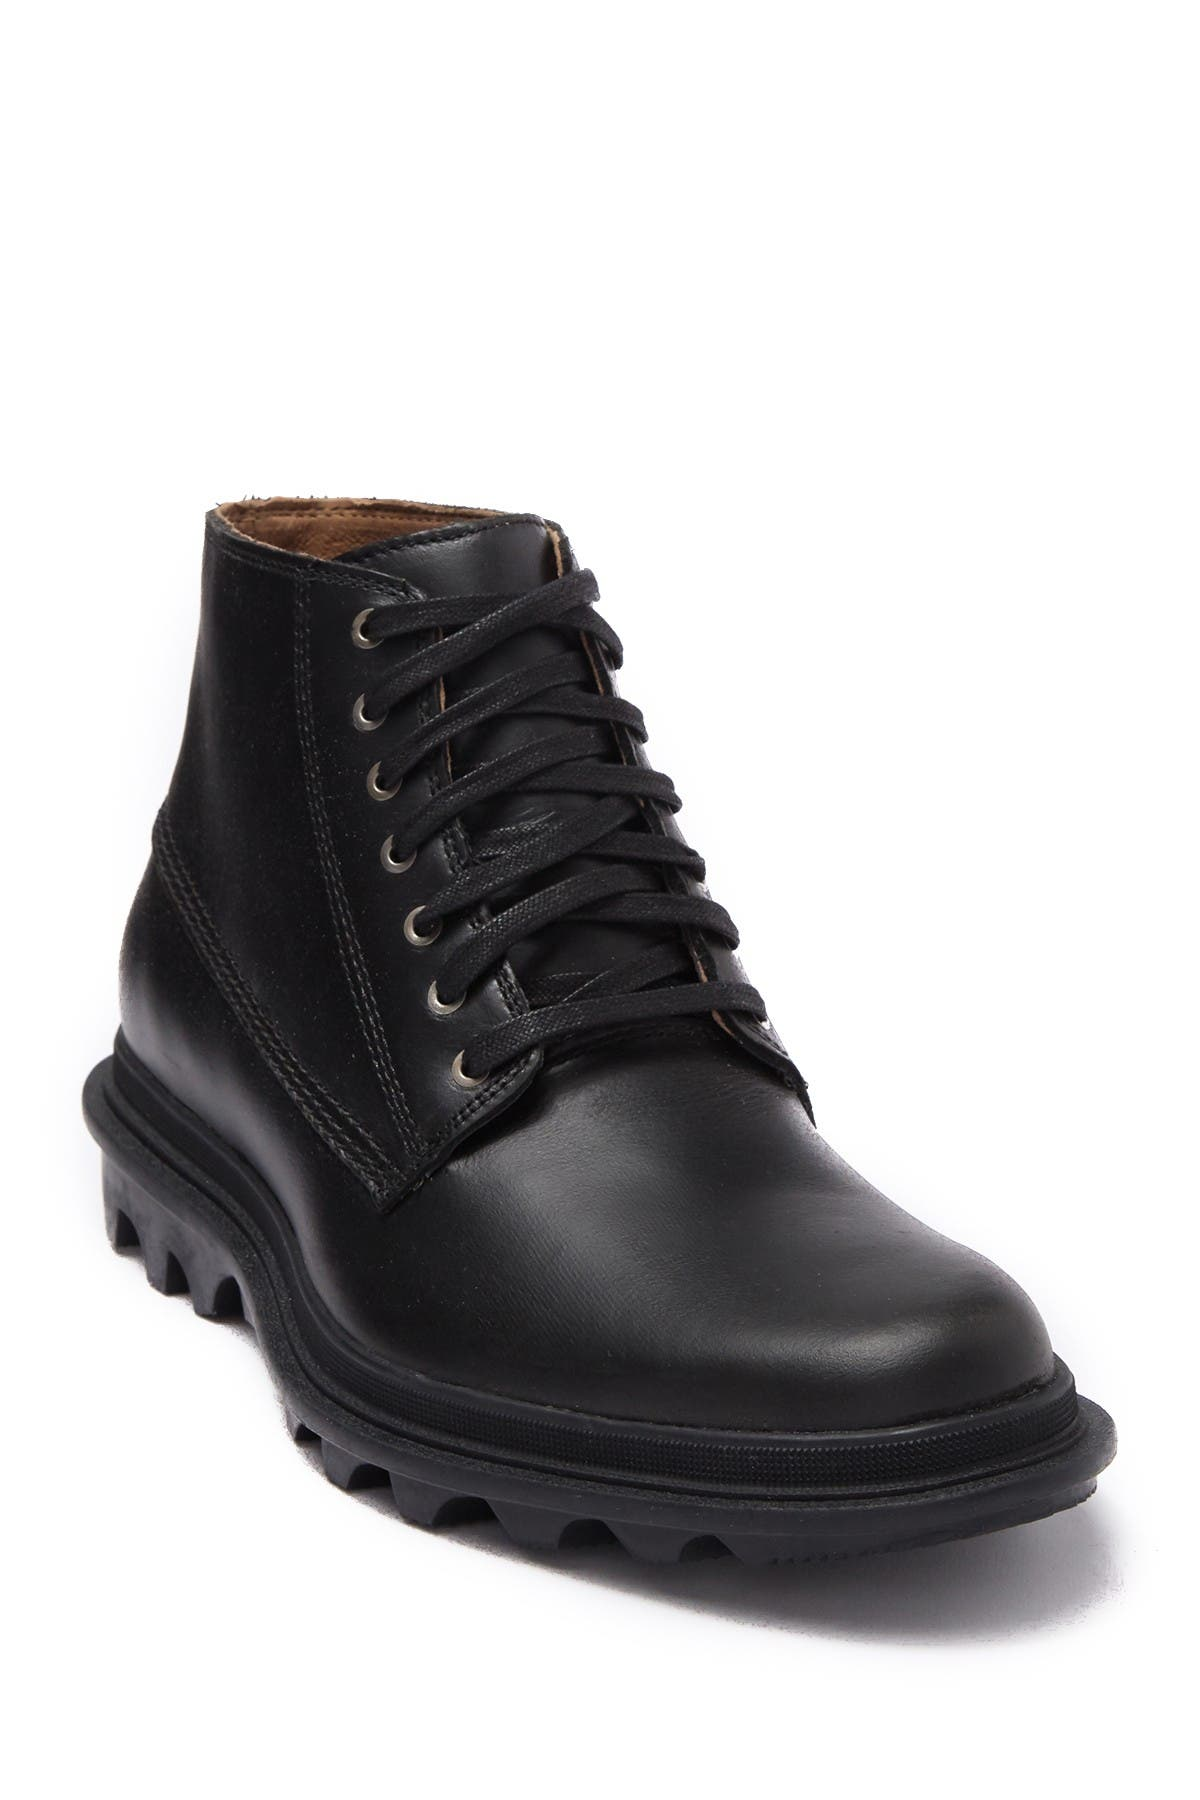 Sorel | Ace Chukka Waterproof Leather